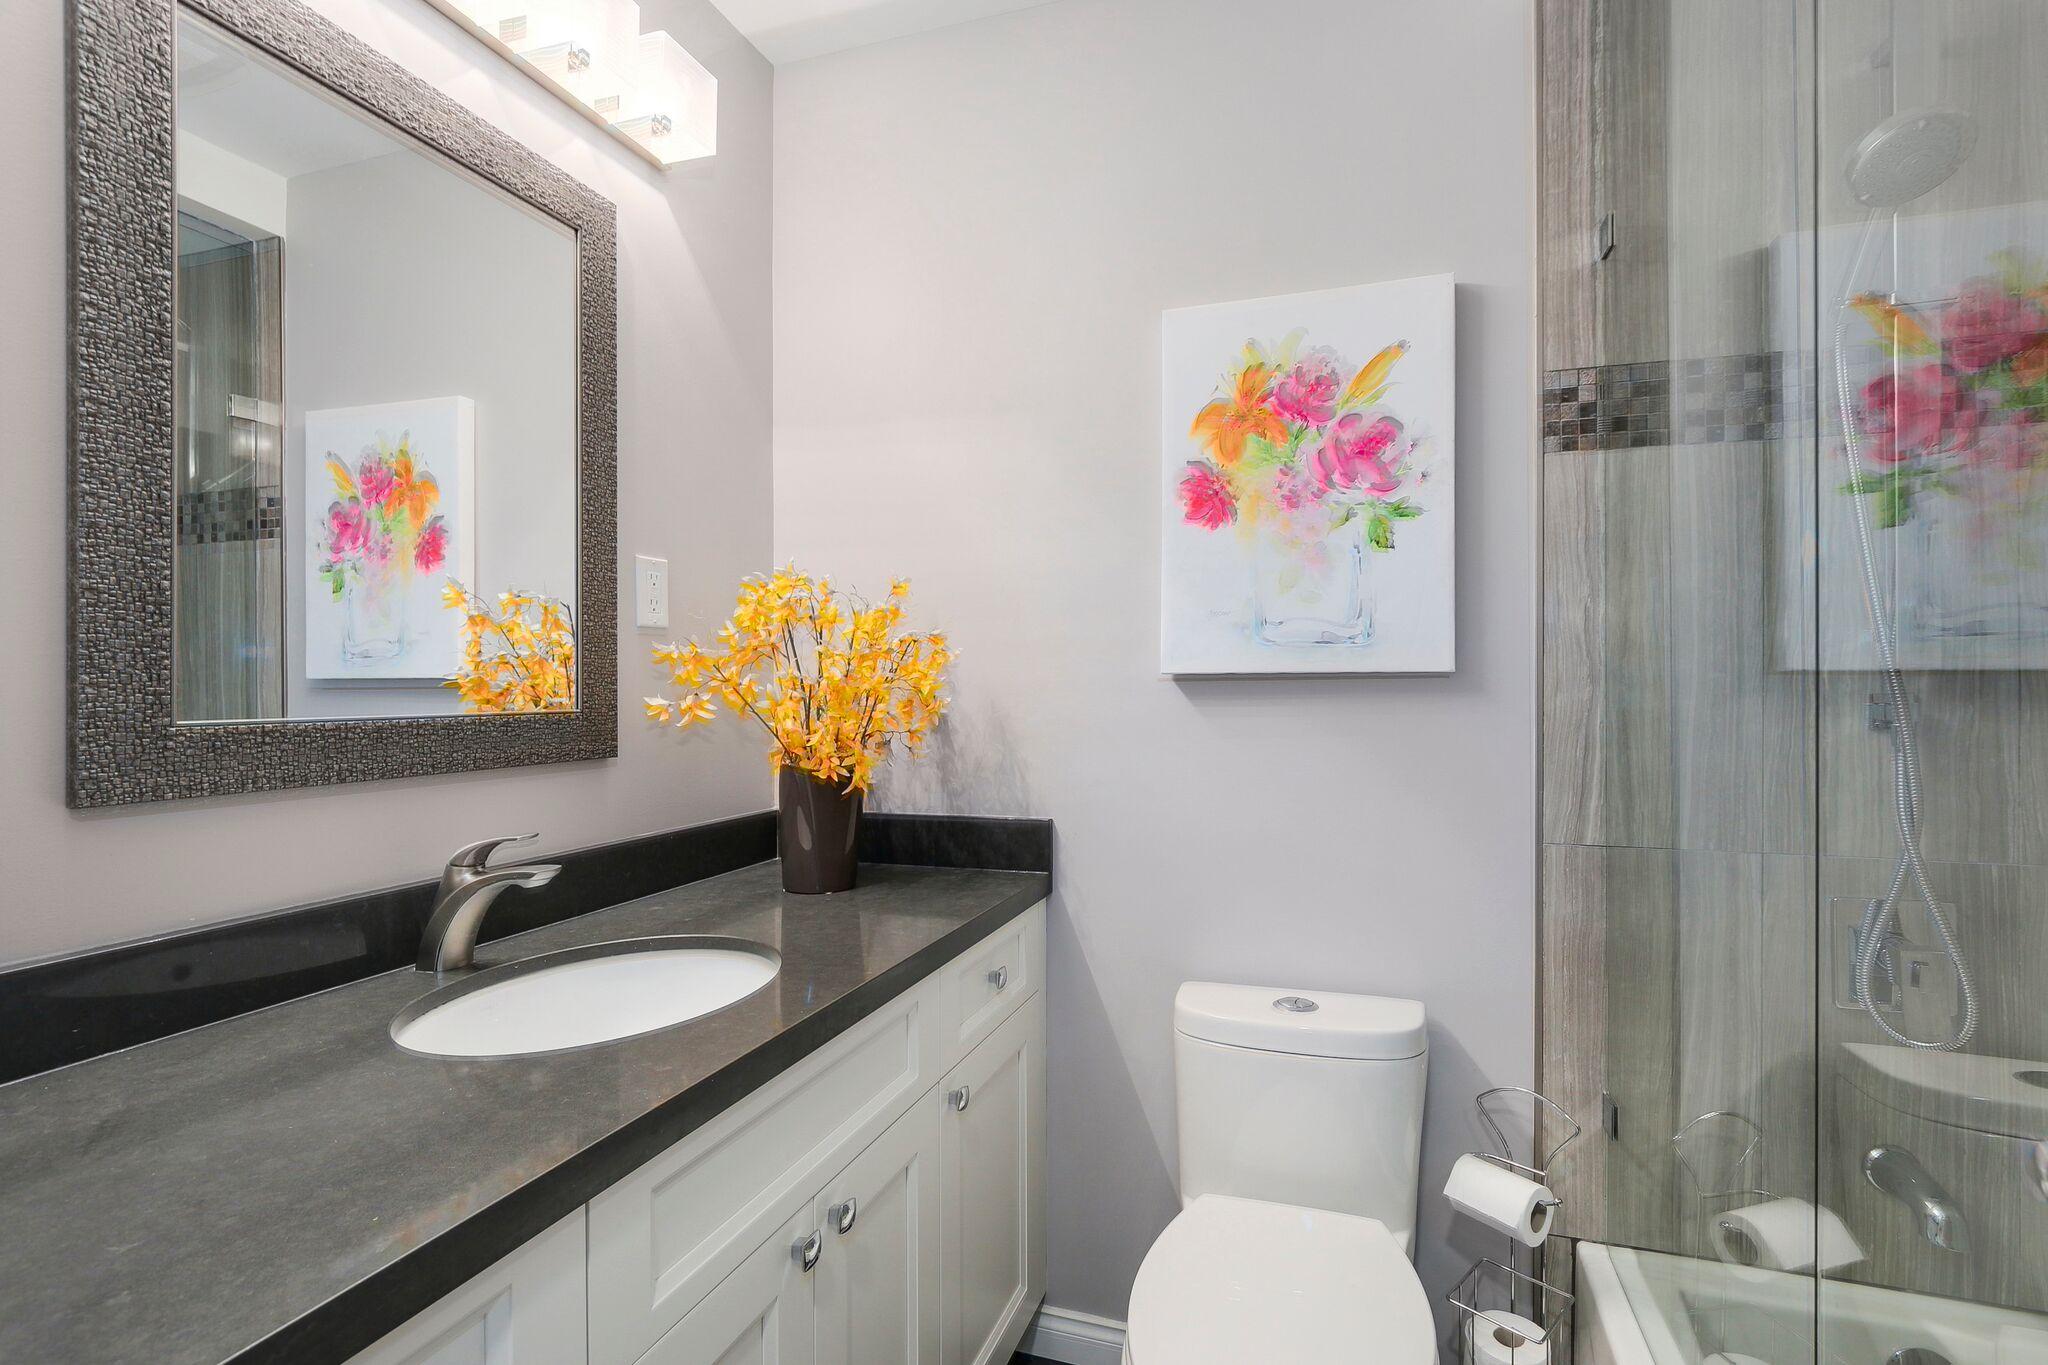 Luxury Guest Bathroom Renovation in Coquitlam